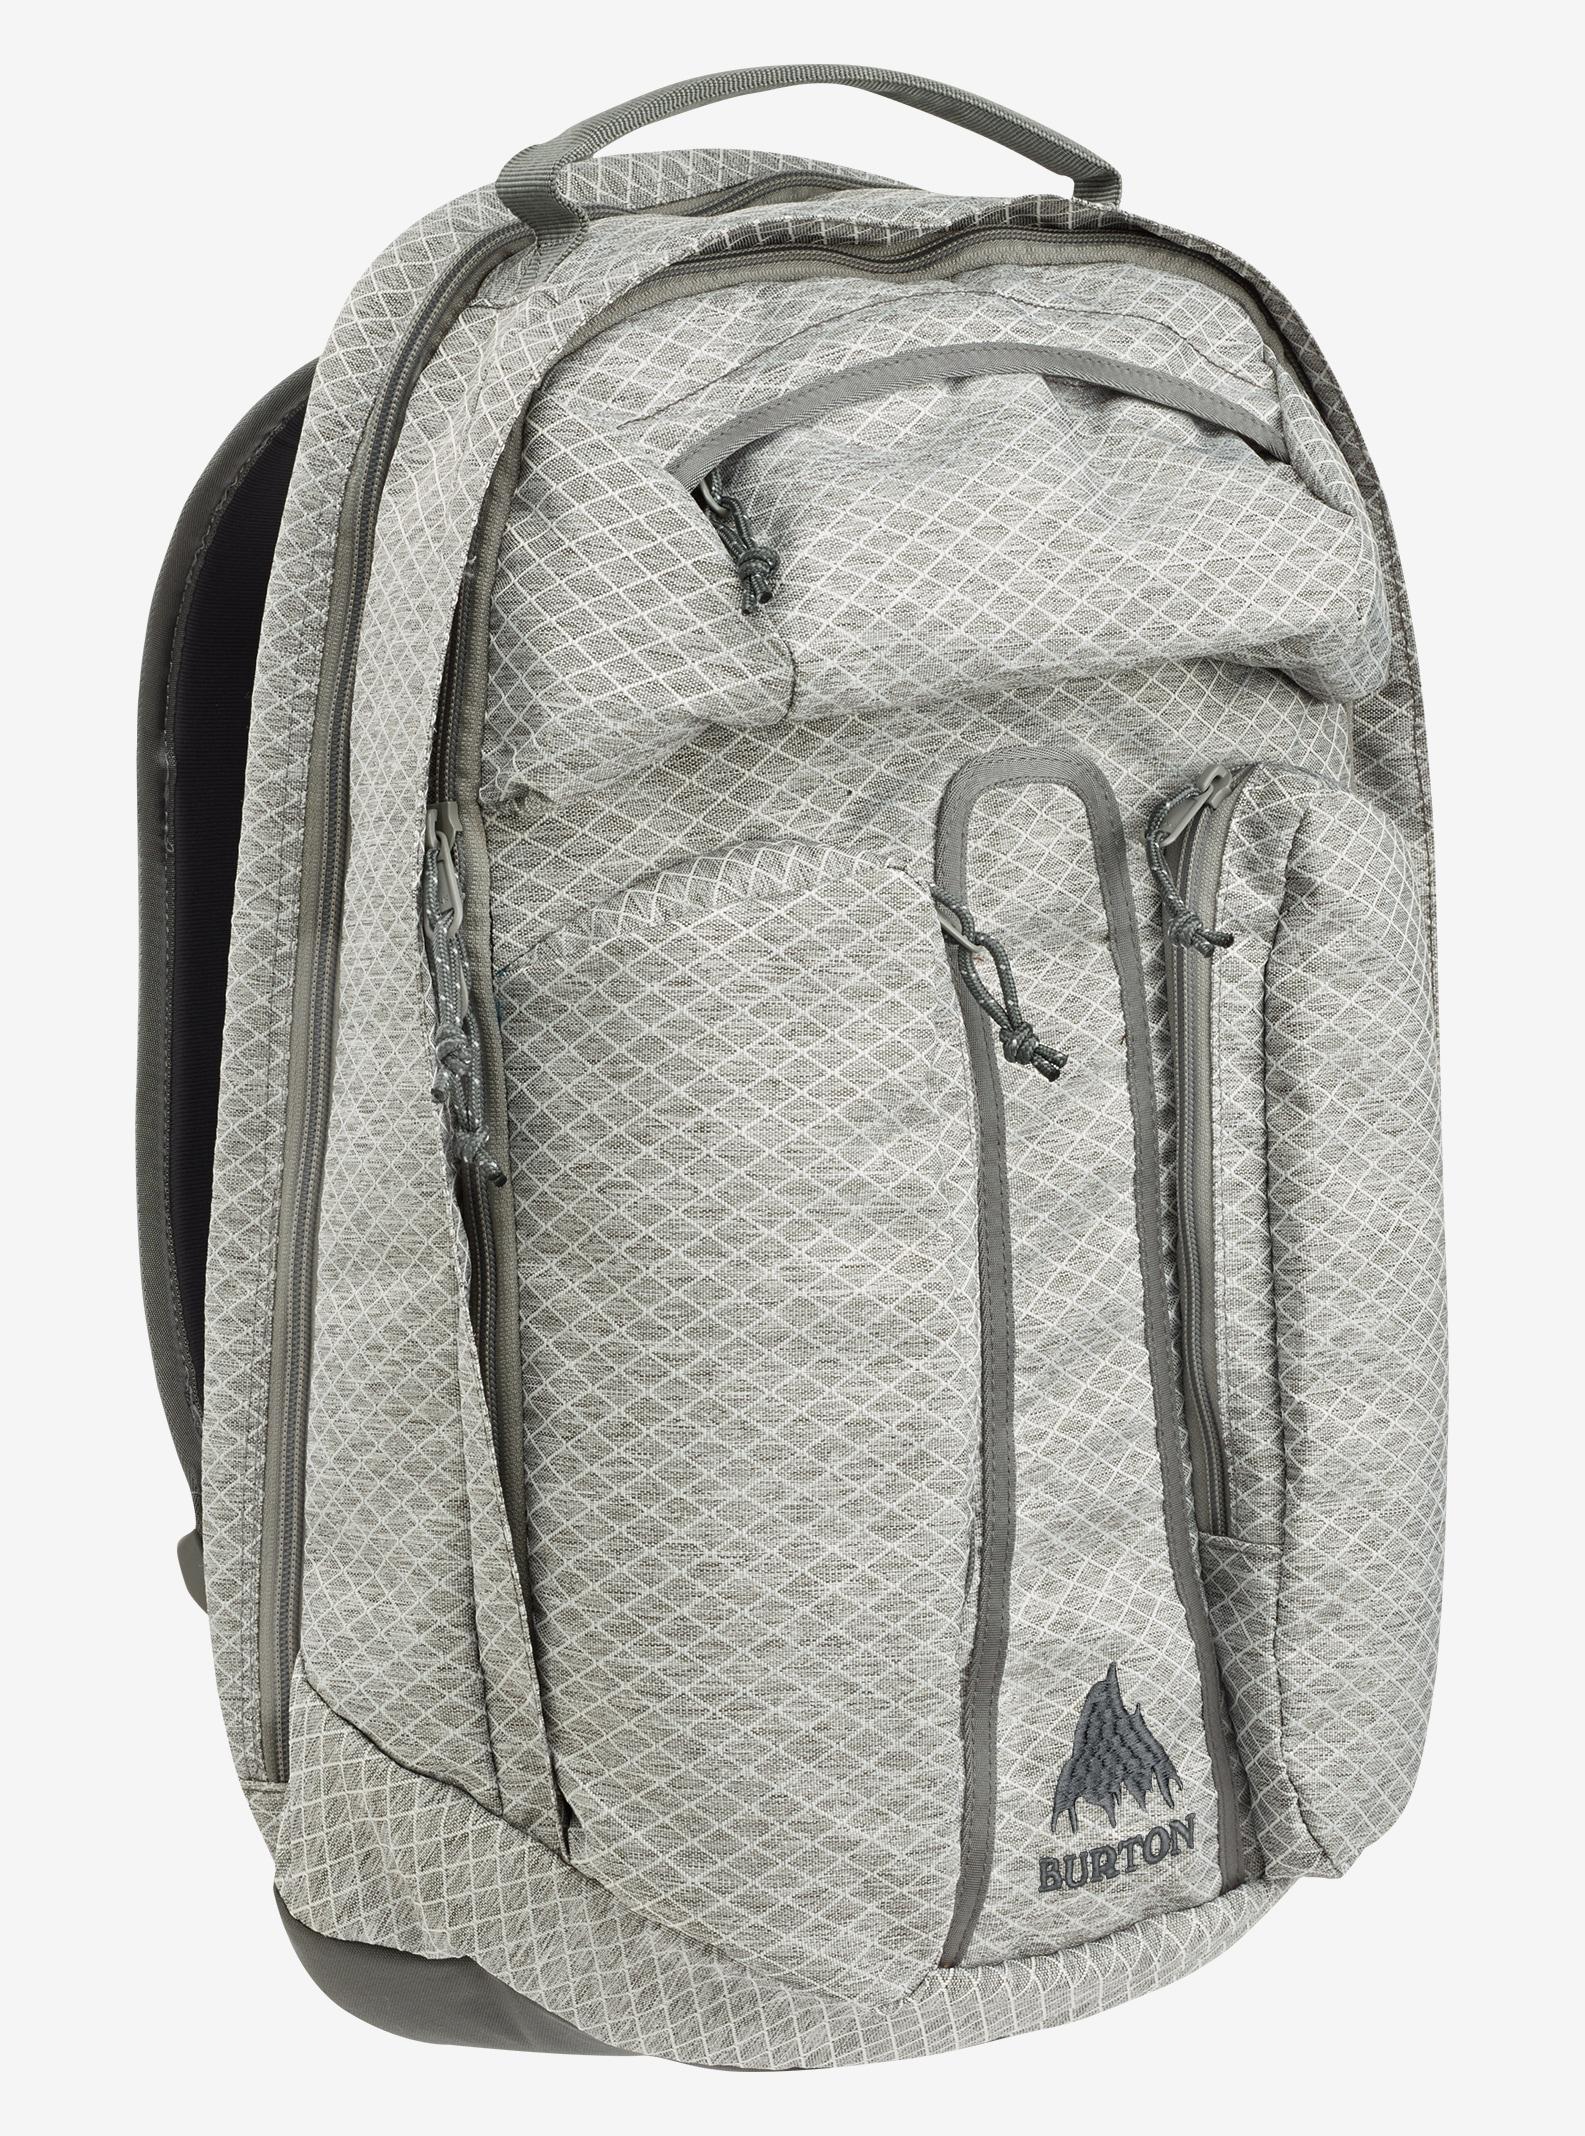 Burton Curbshark Backpack shown in Grey Heather Diamond Ripstop